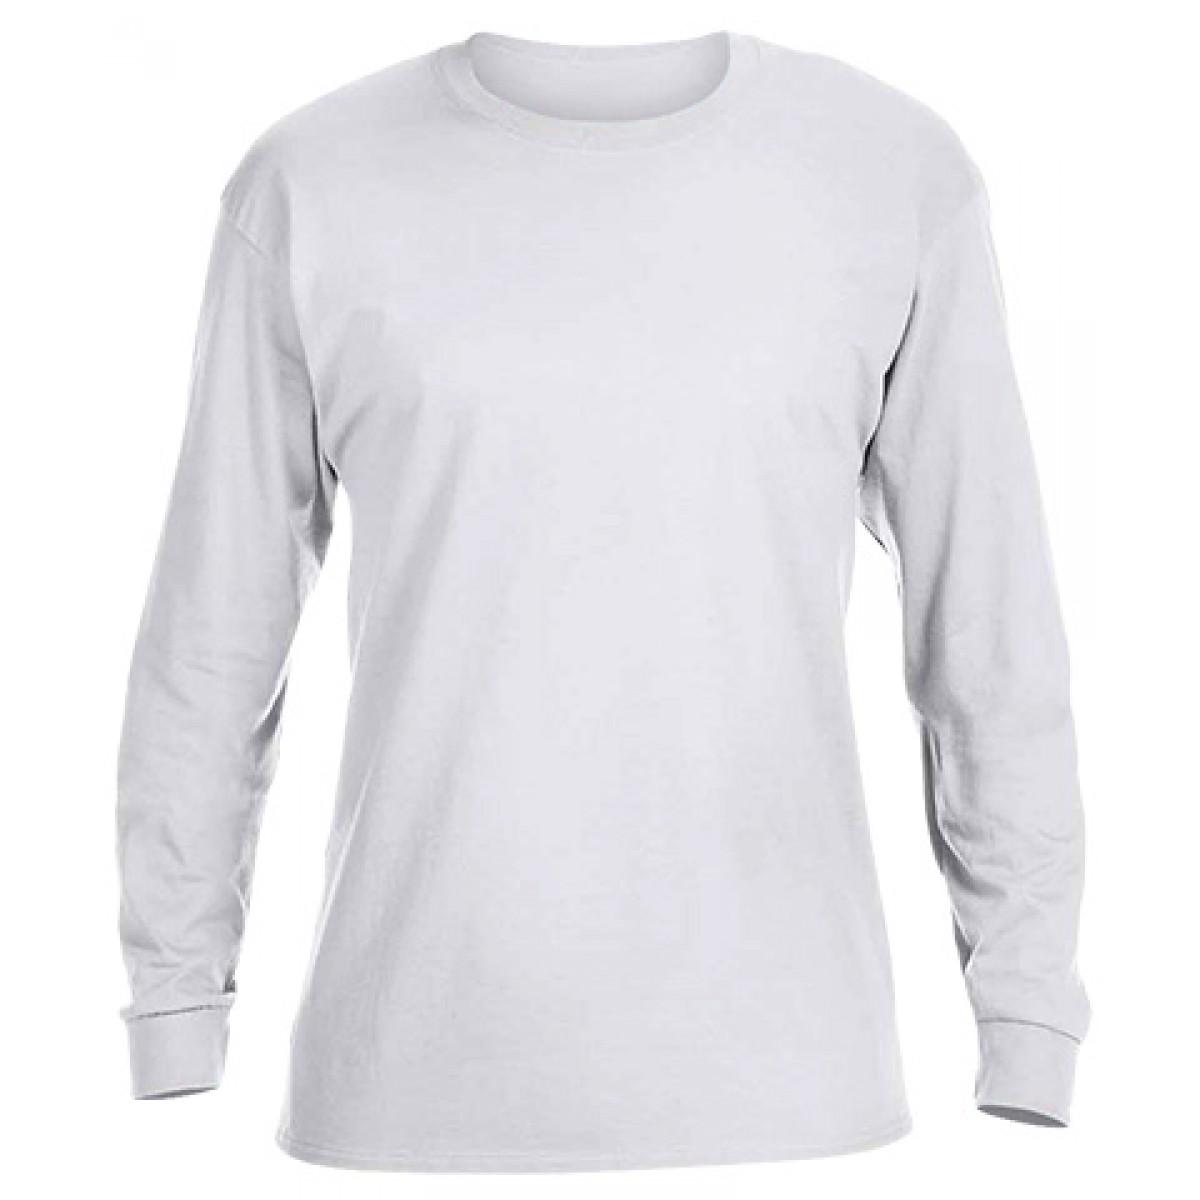 Ultra Cotton Long-Sleeve T-Shirt-White-M